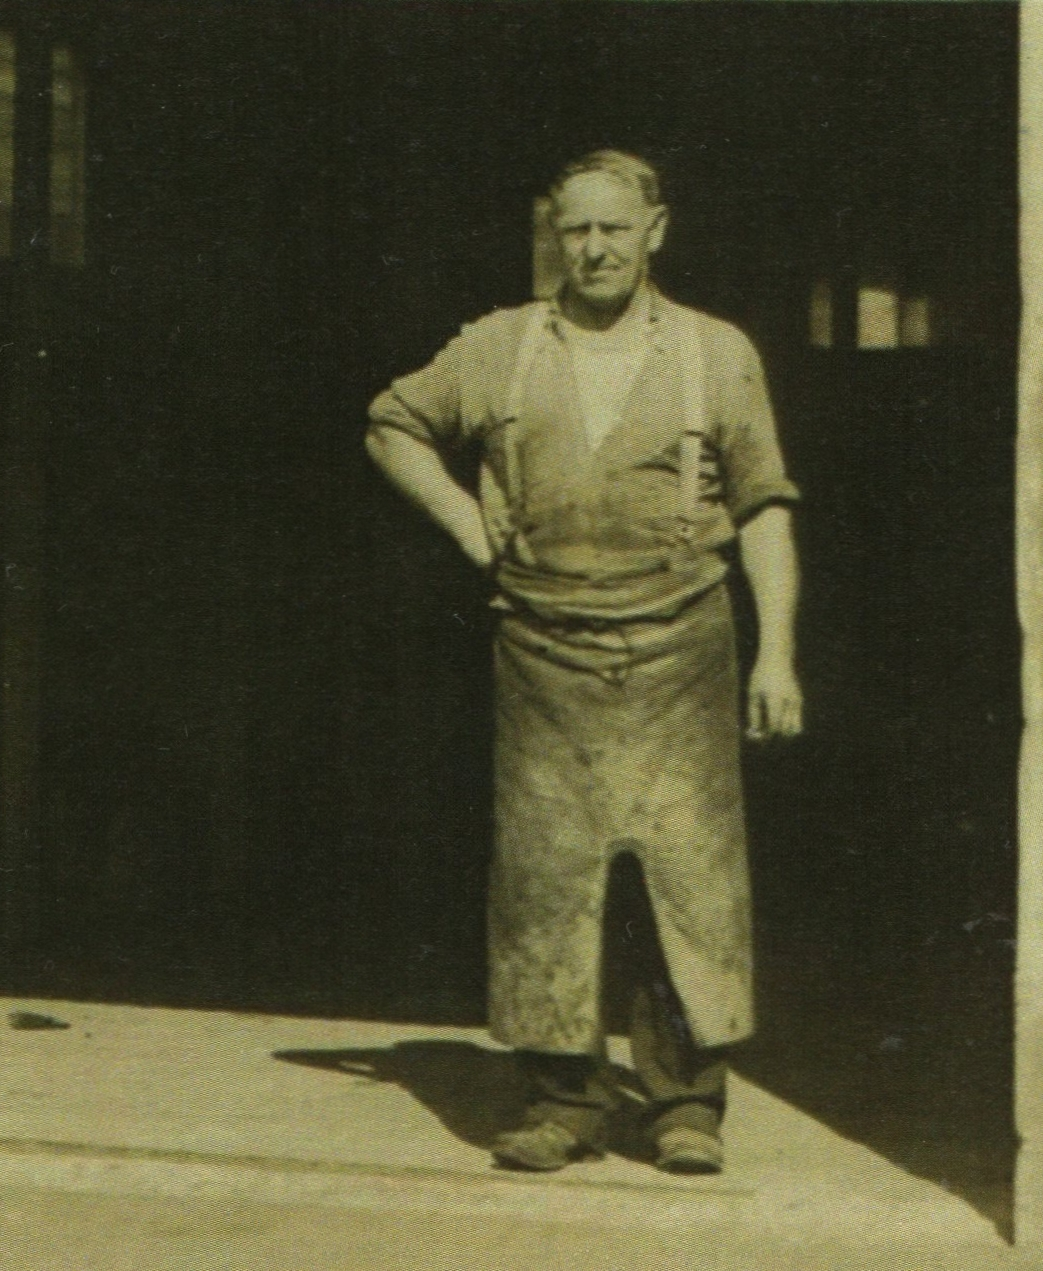 Michael Kowalewski,  in his blacksmith's apron in the doorway of his blacksmith's forge.